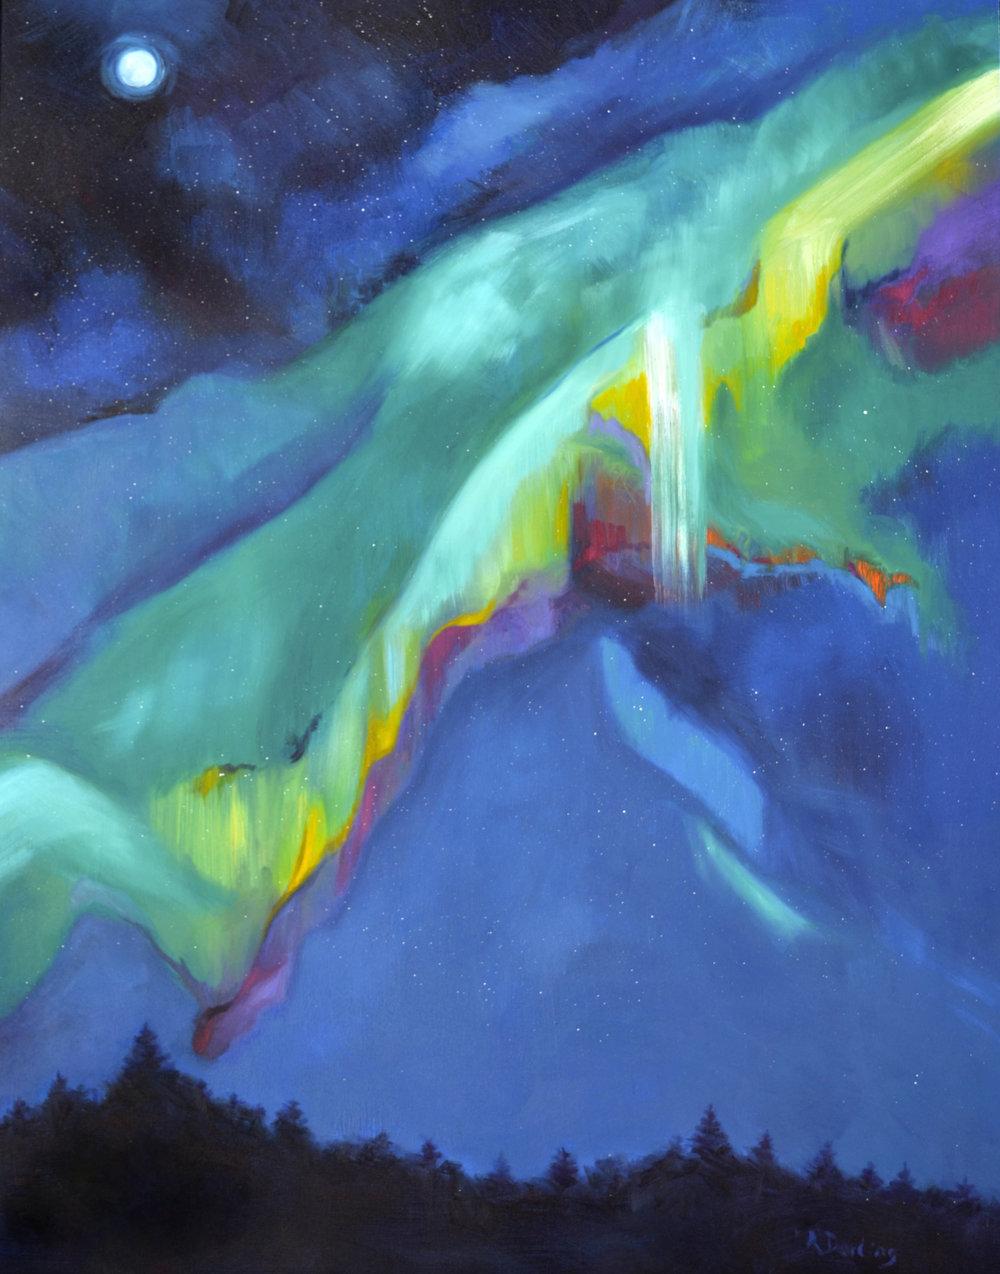 Northern Lights: Artistic License